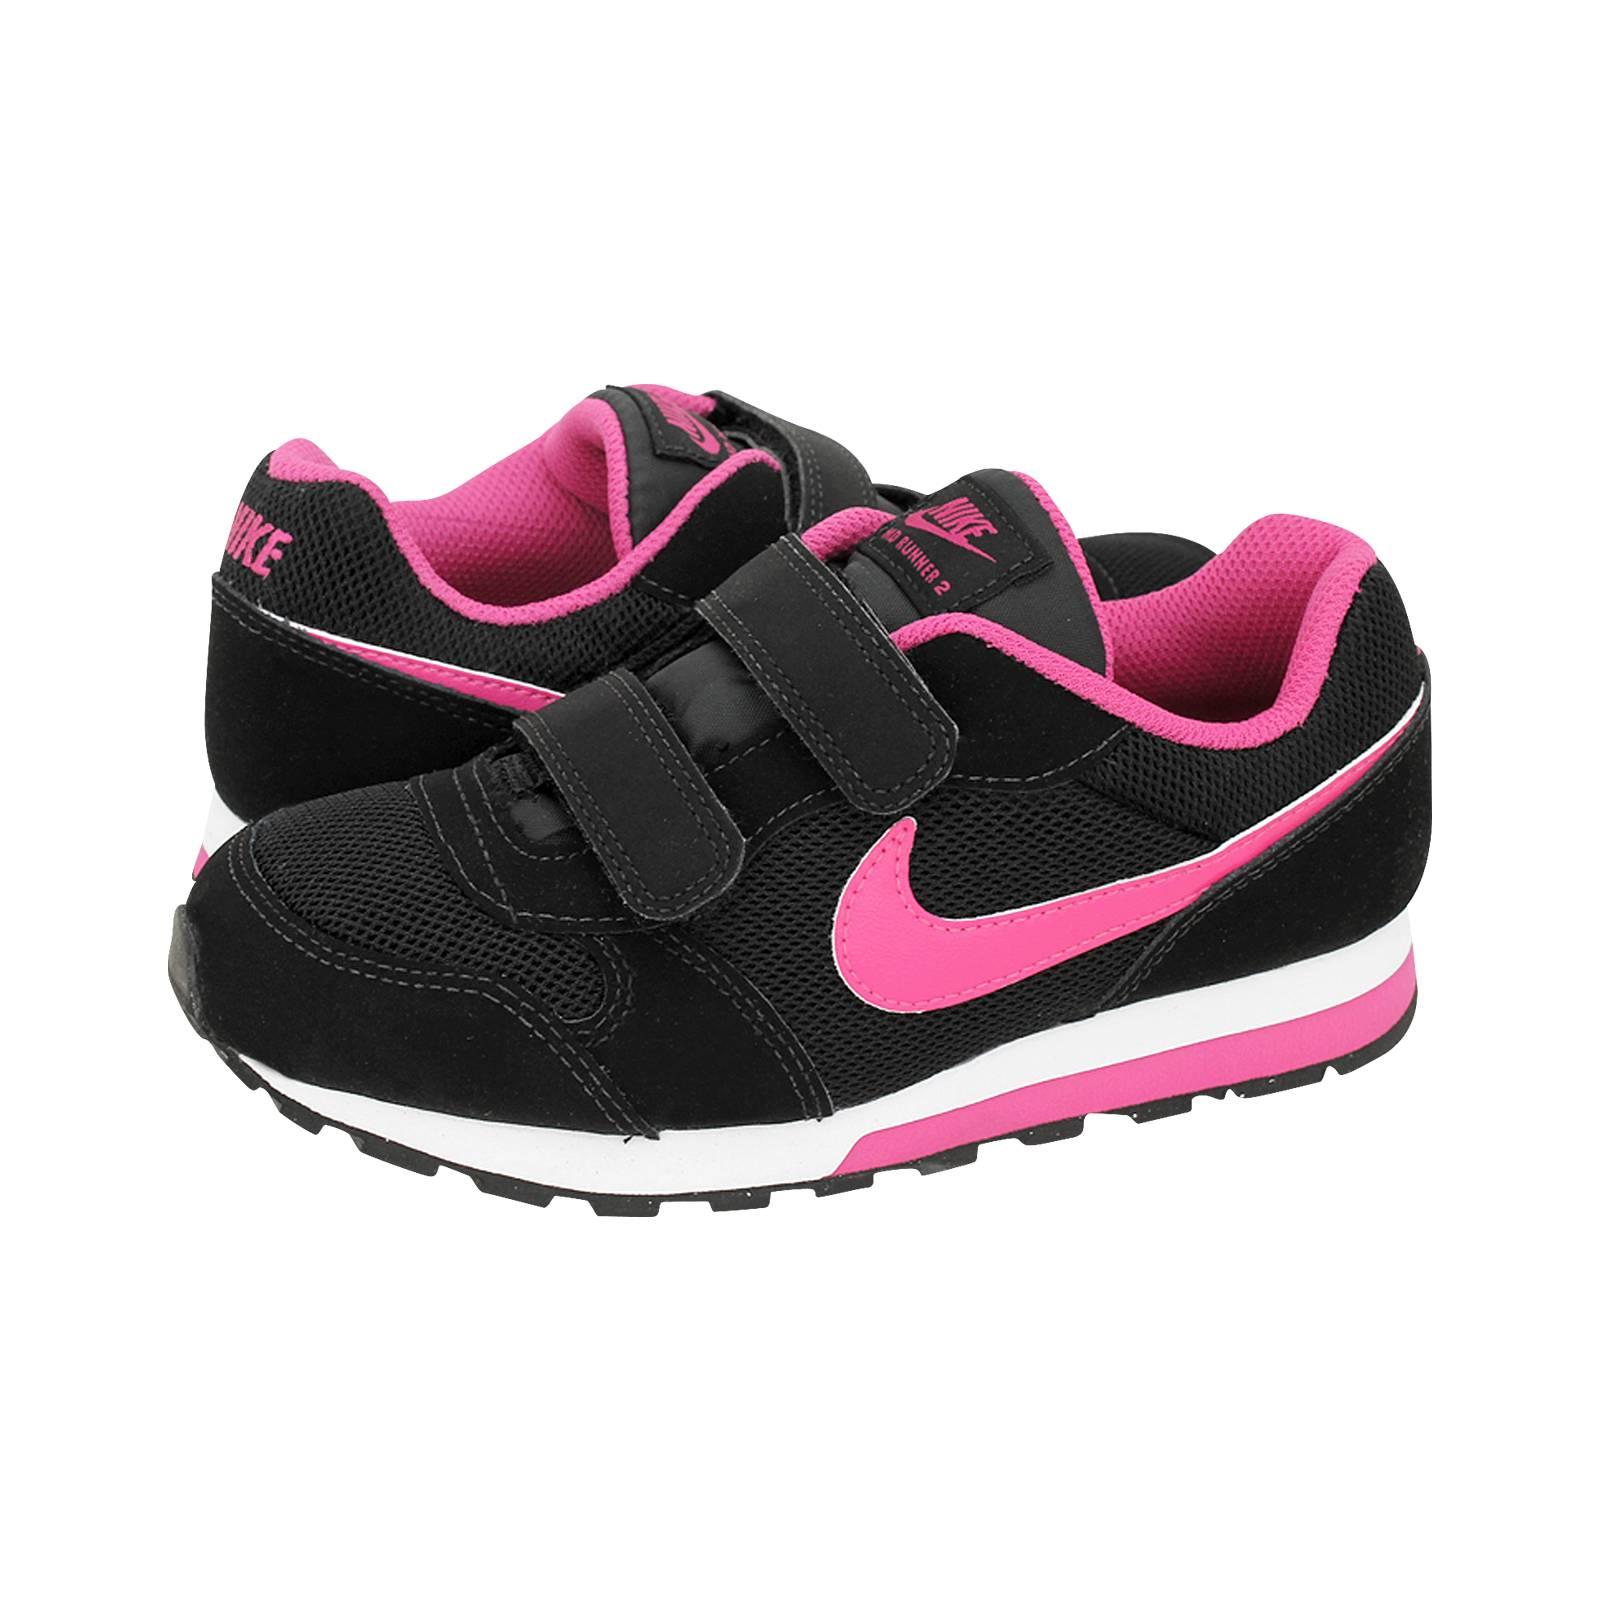 1082e1c6ed4 Αθλητικά Παιδικά Παπούτσια Nike MD Runner 2 PSV